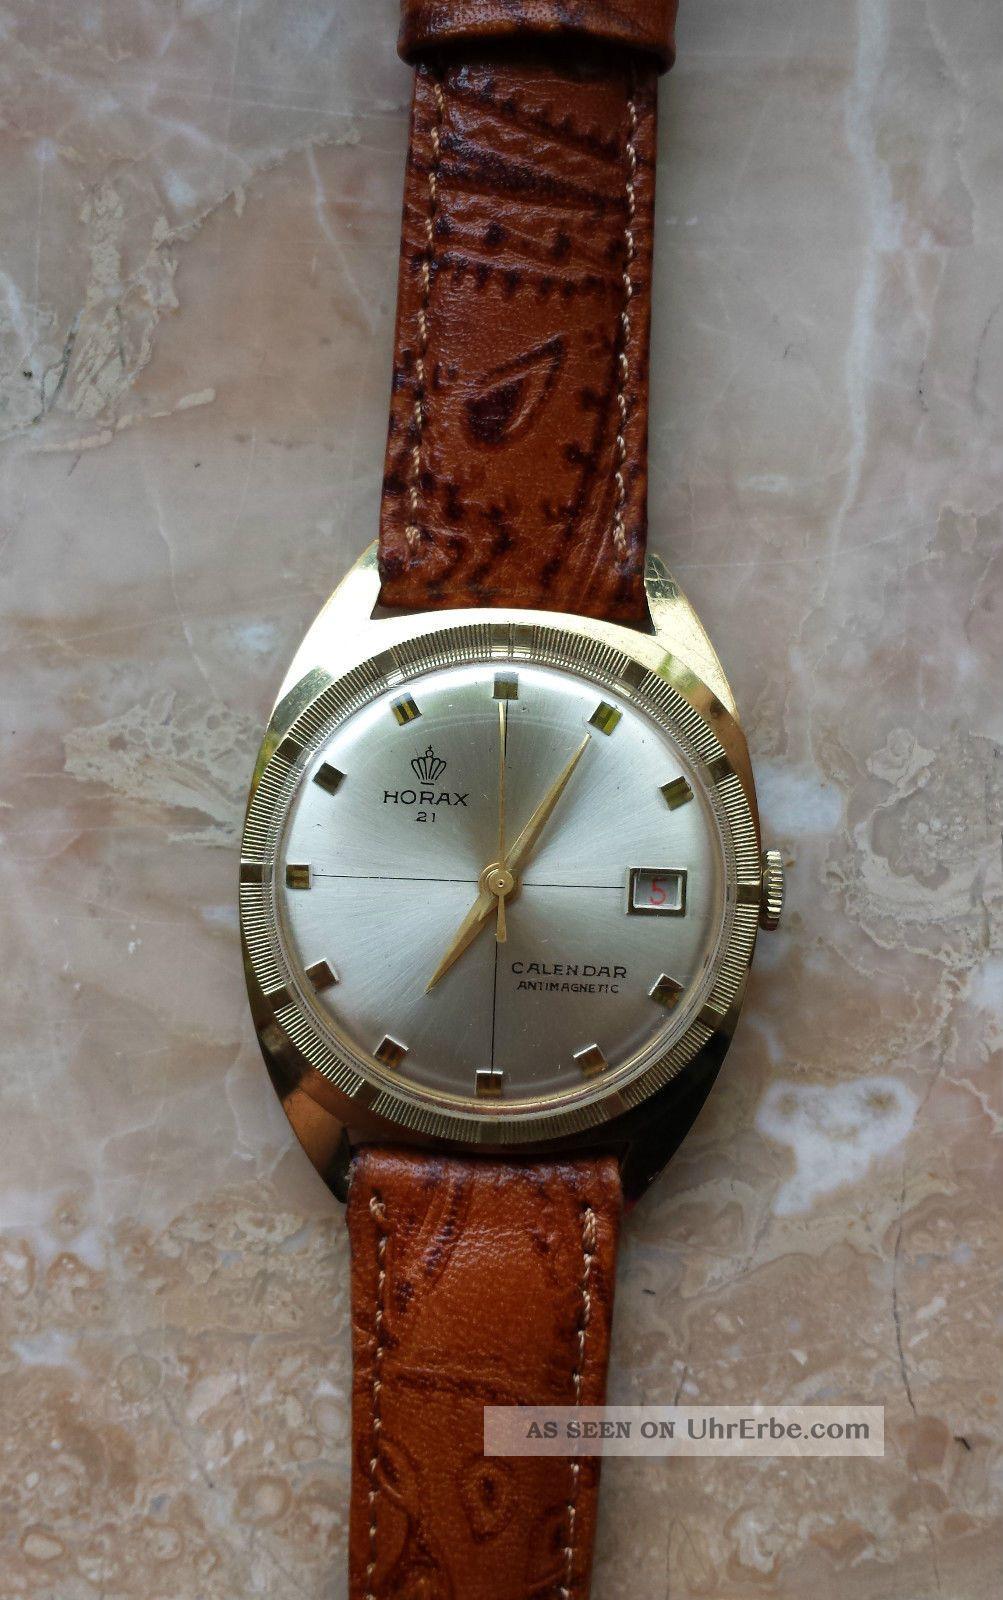 Horax Armbanduhr Handaufzug Goldfarbig Lederband Braun Armbanduhren Bild